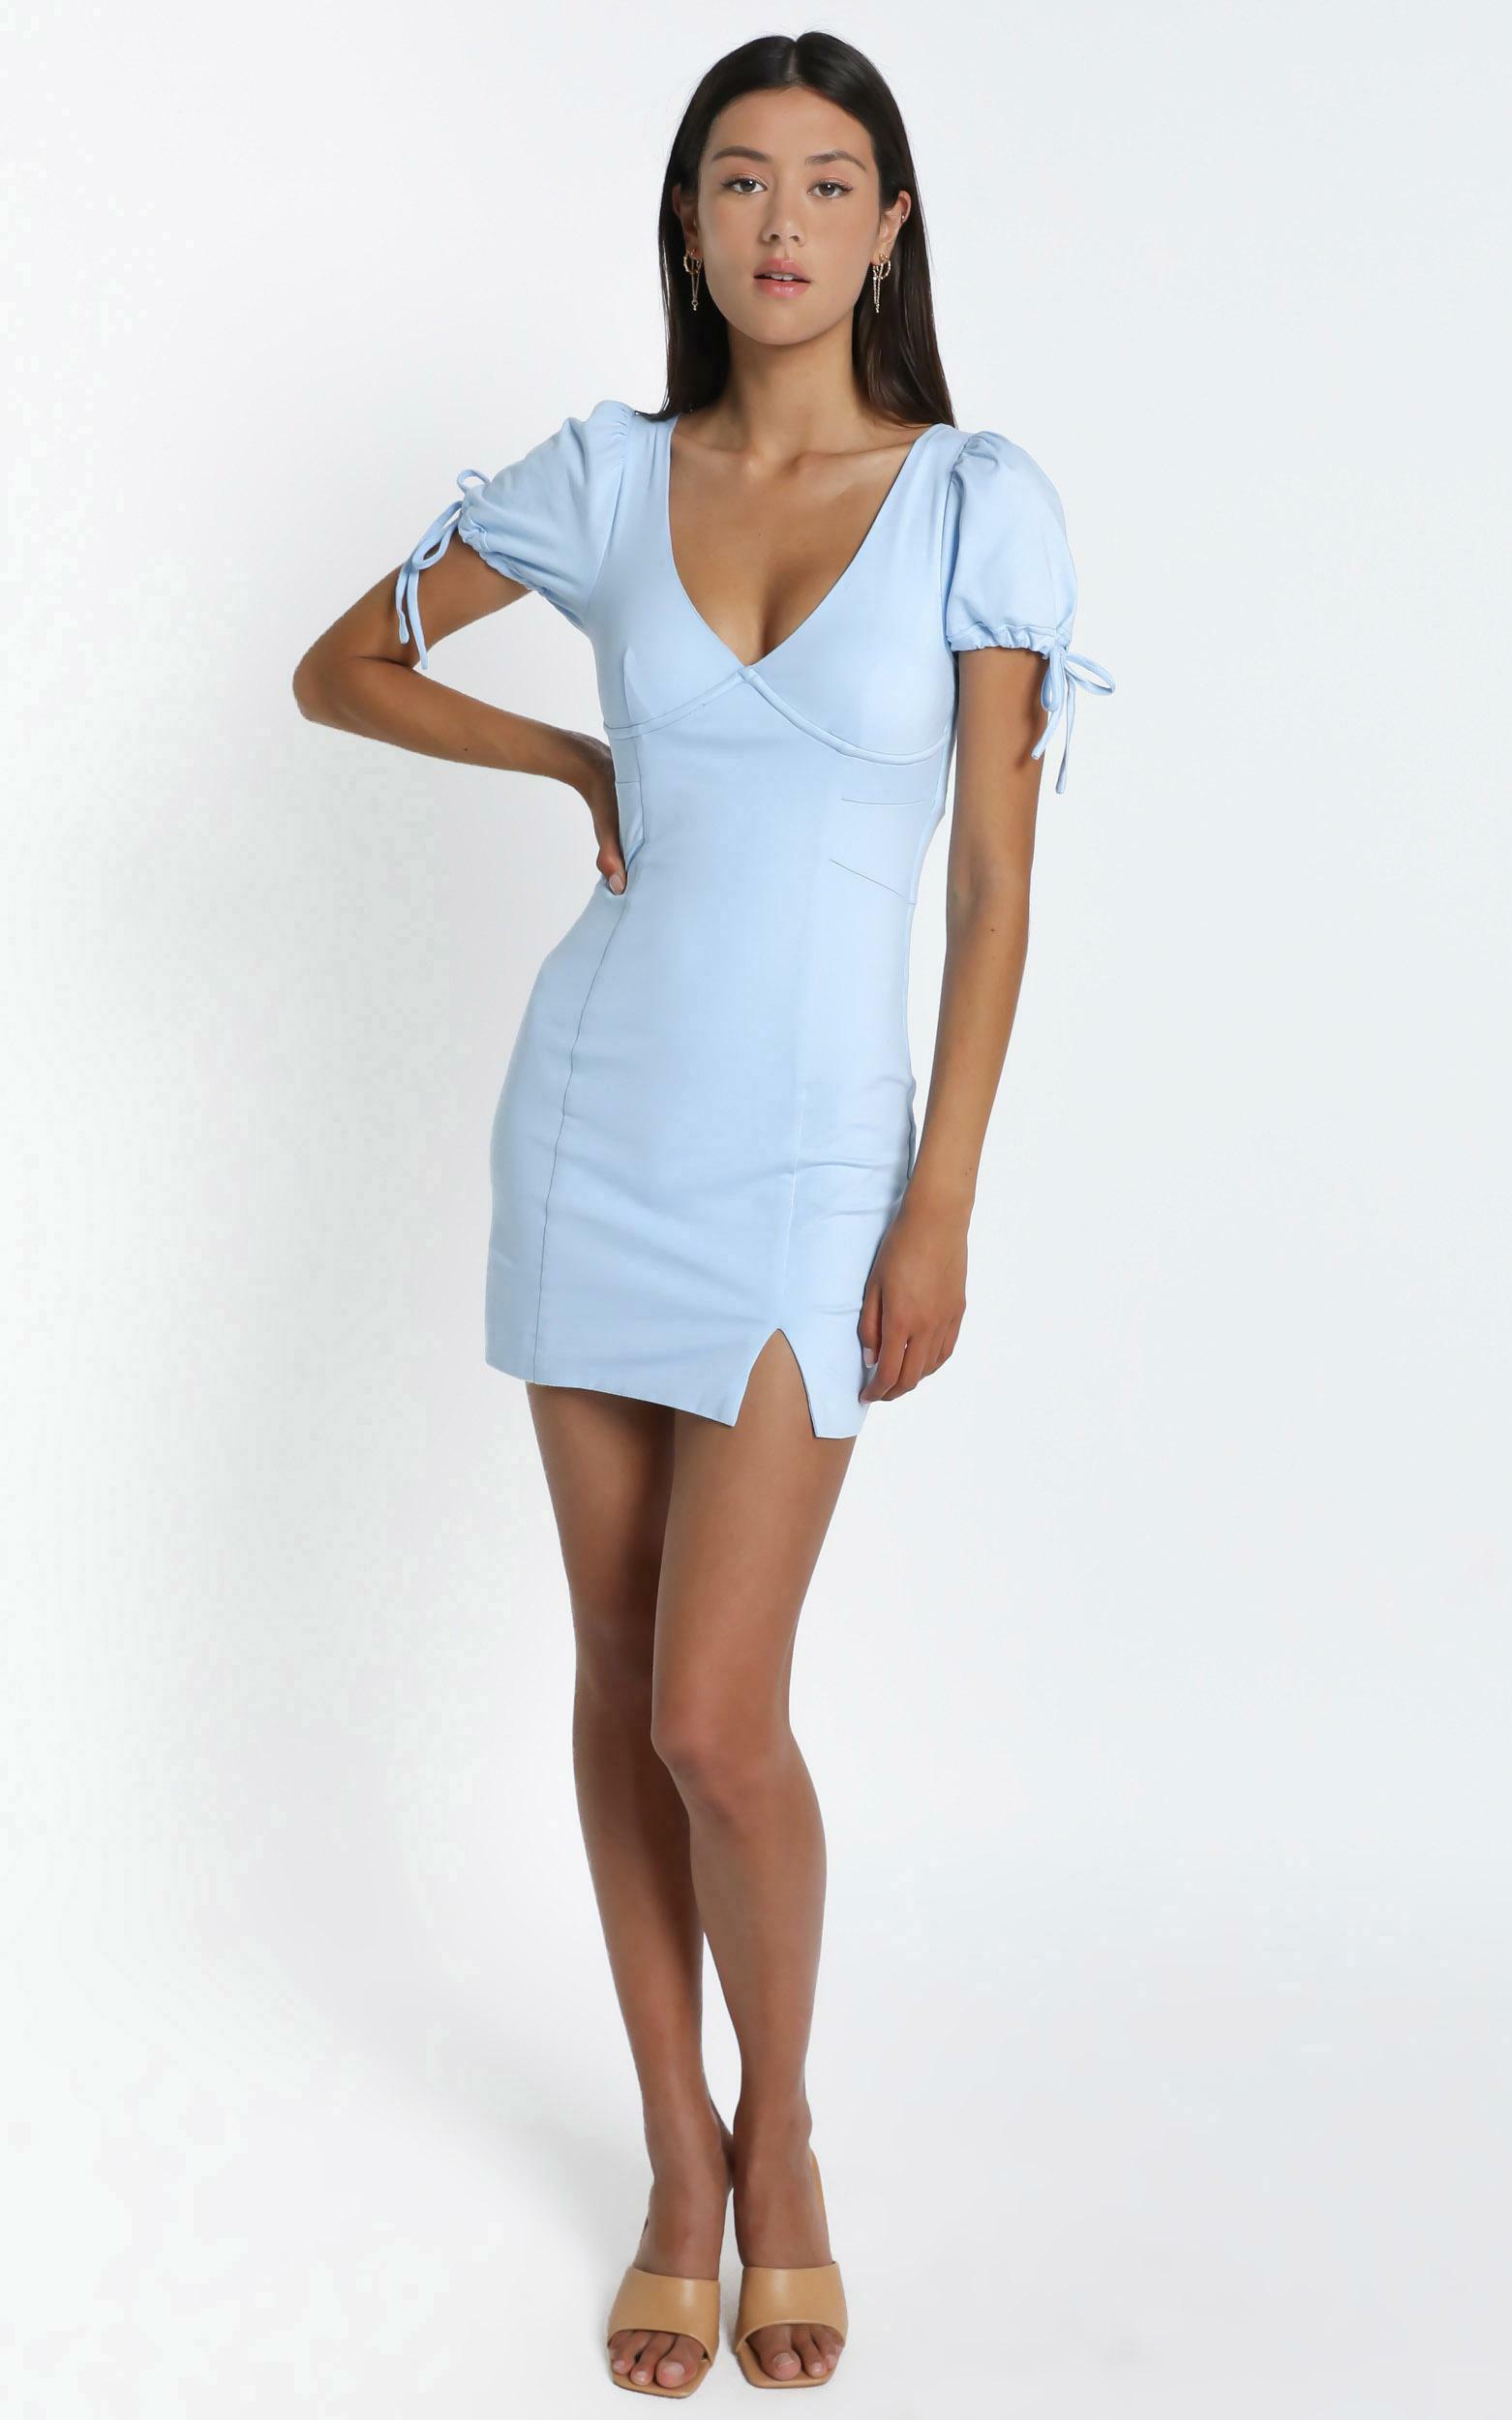 Honey Dress in Powder Blue - 6 (XS), BLU17, hi-res image number null